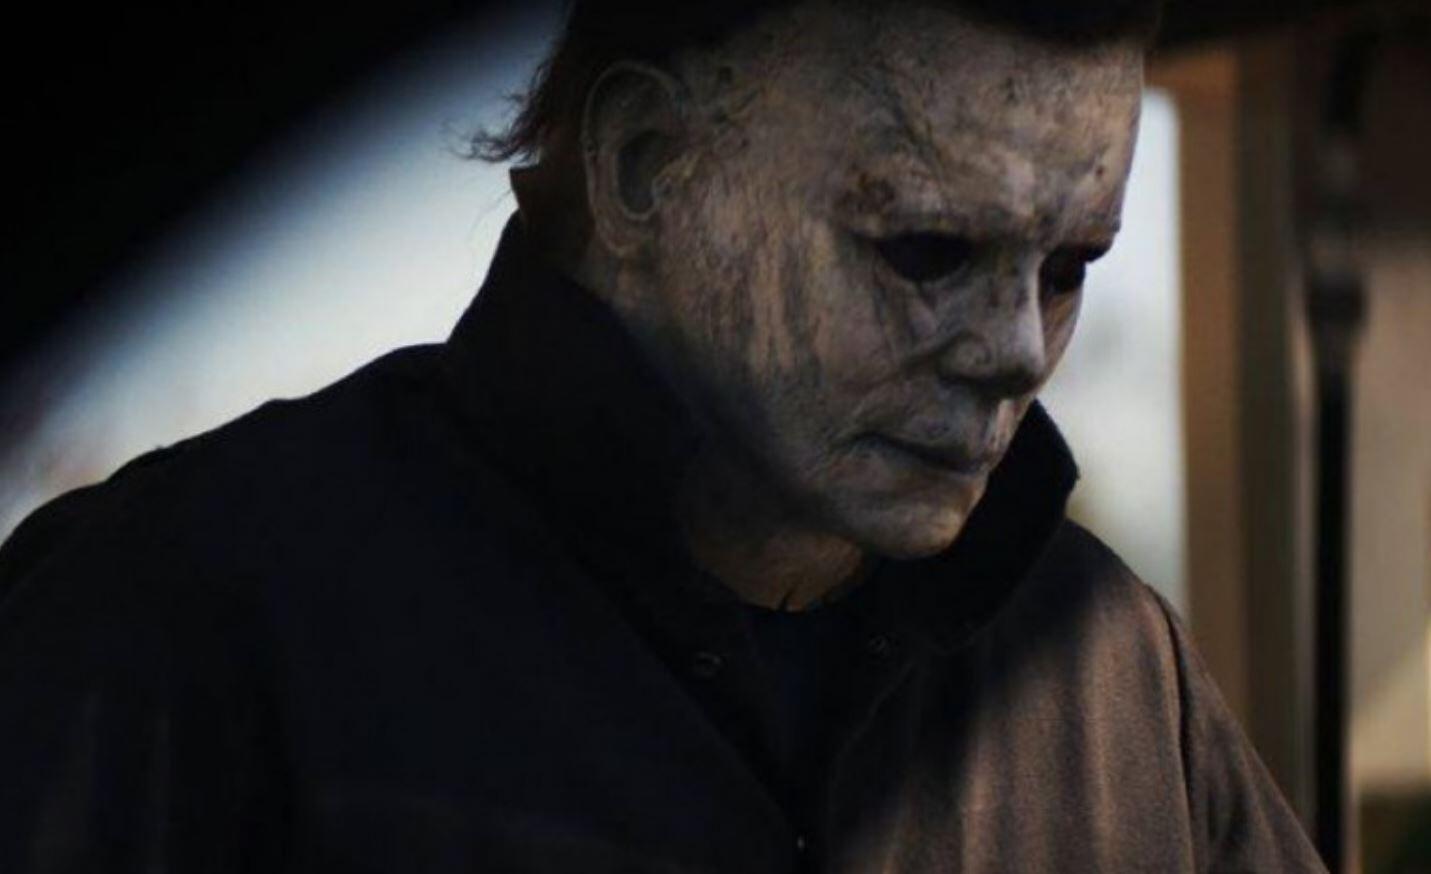 Halloween 2020 Christopher Nelson Do Halloween Kills' Photos Shared By FX Artist Christopher Nelson